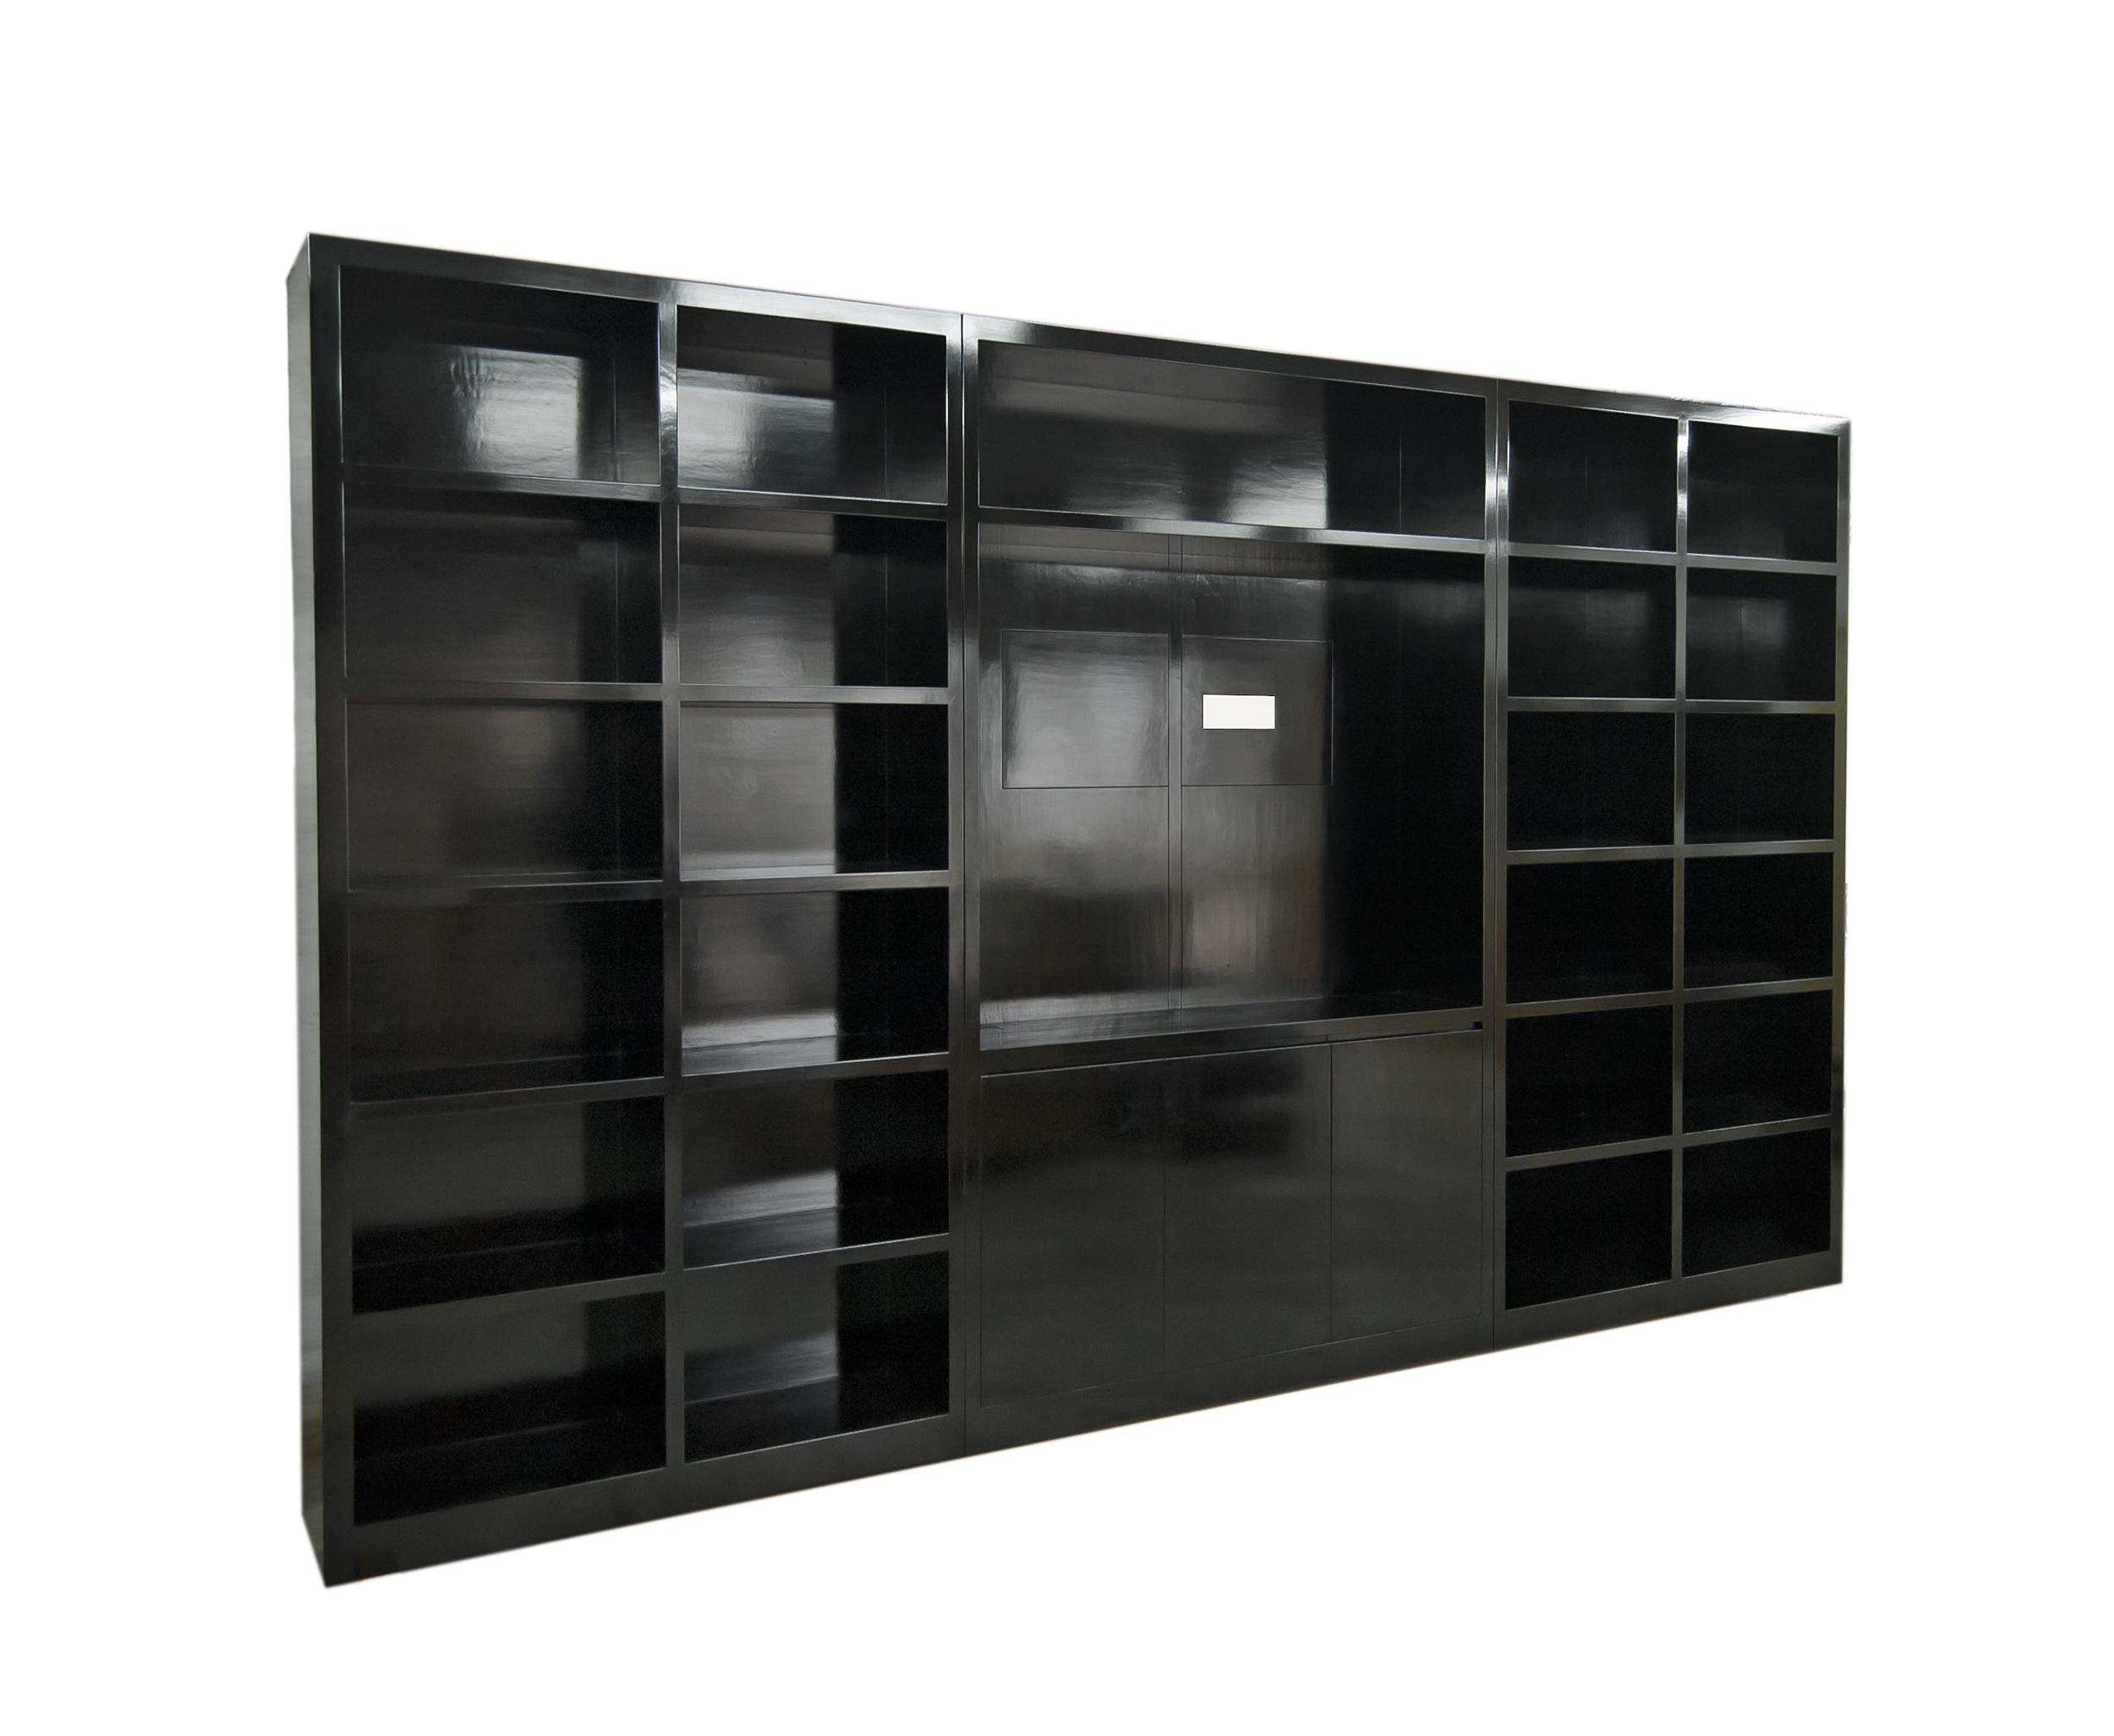 ....Bespoke Modern furniture : Compound TV Shelf..特别定制现代家具: 组合电视书架....